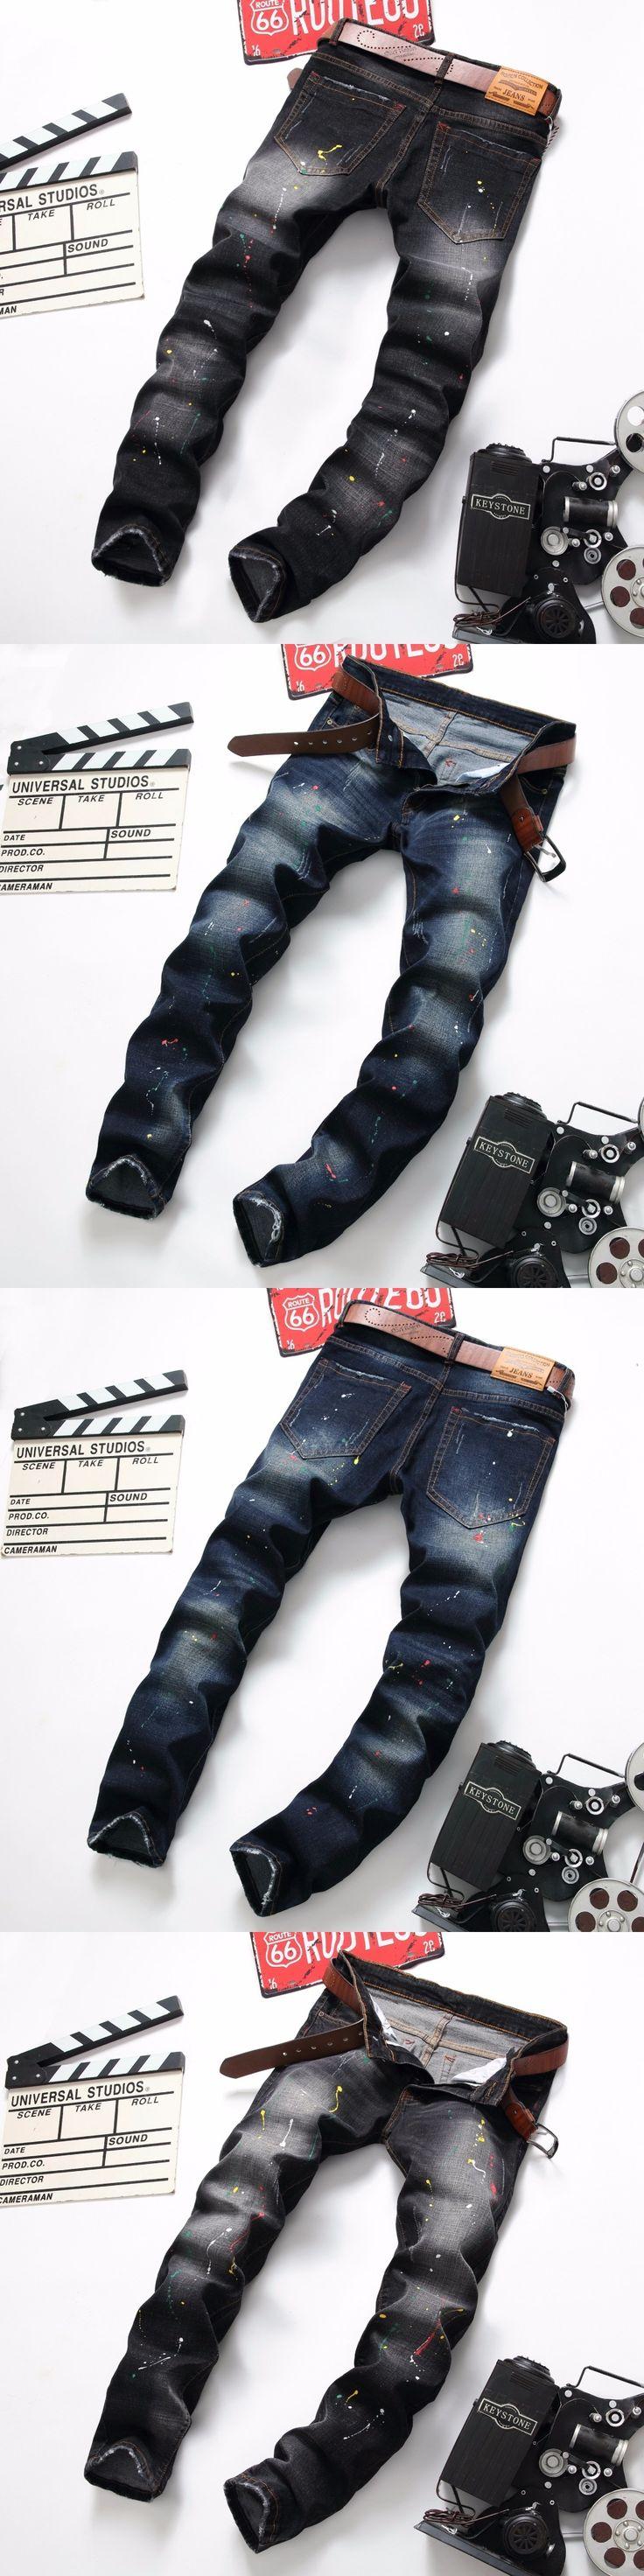 Newsosoo Harajuku Classic Jeans Men Biker Moto Jeans Slim Fit Splashed Ink Denim Blue Black Hip Hop Streetwear Rap Pants mens